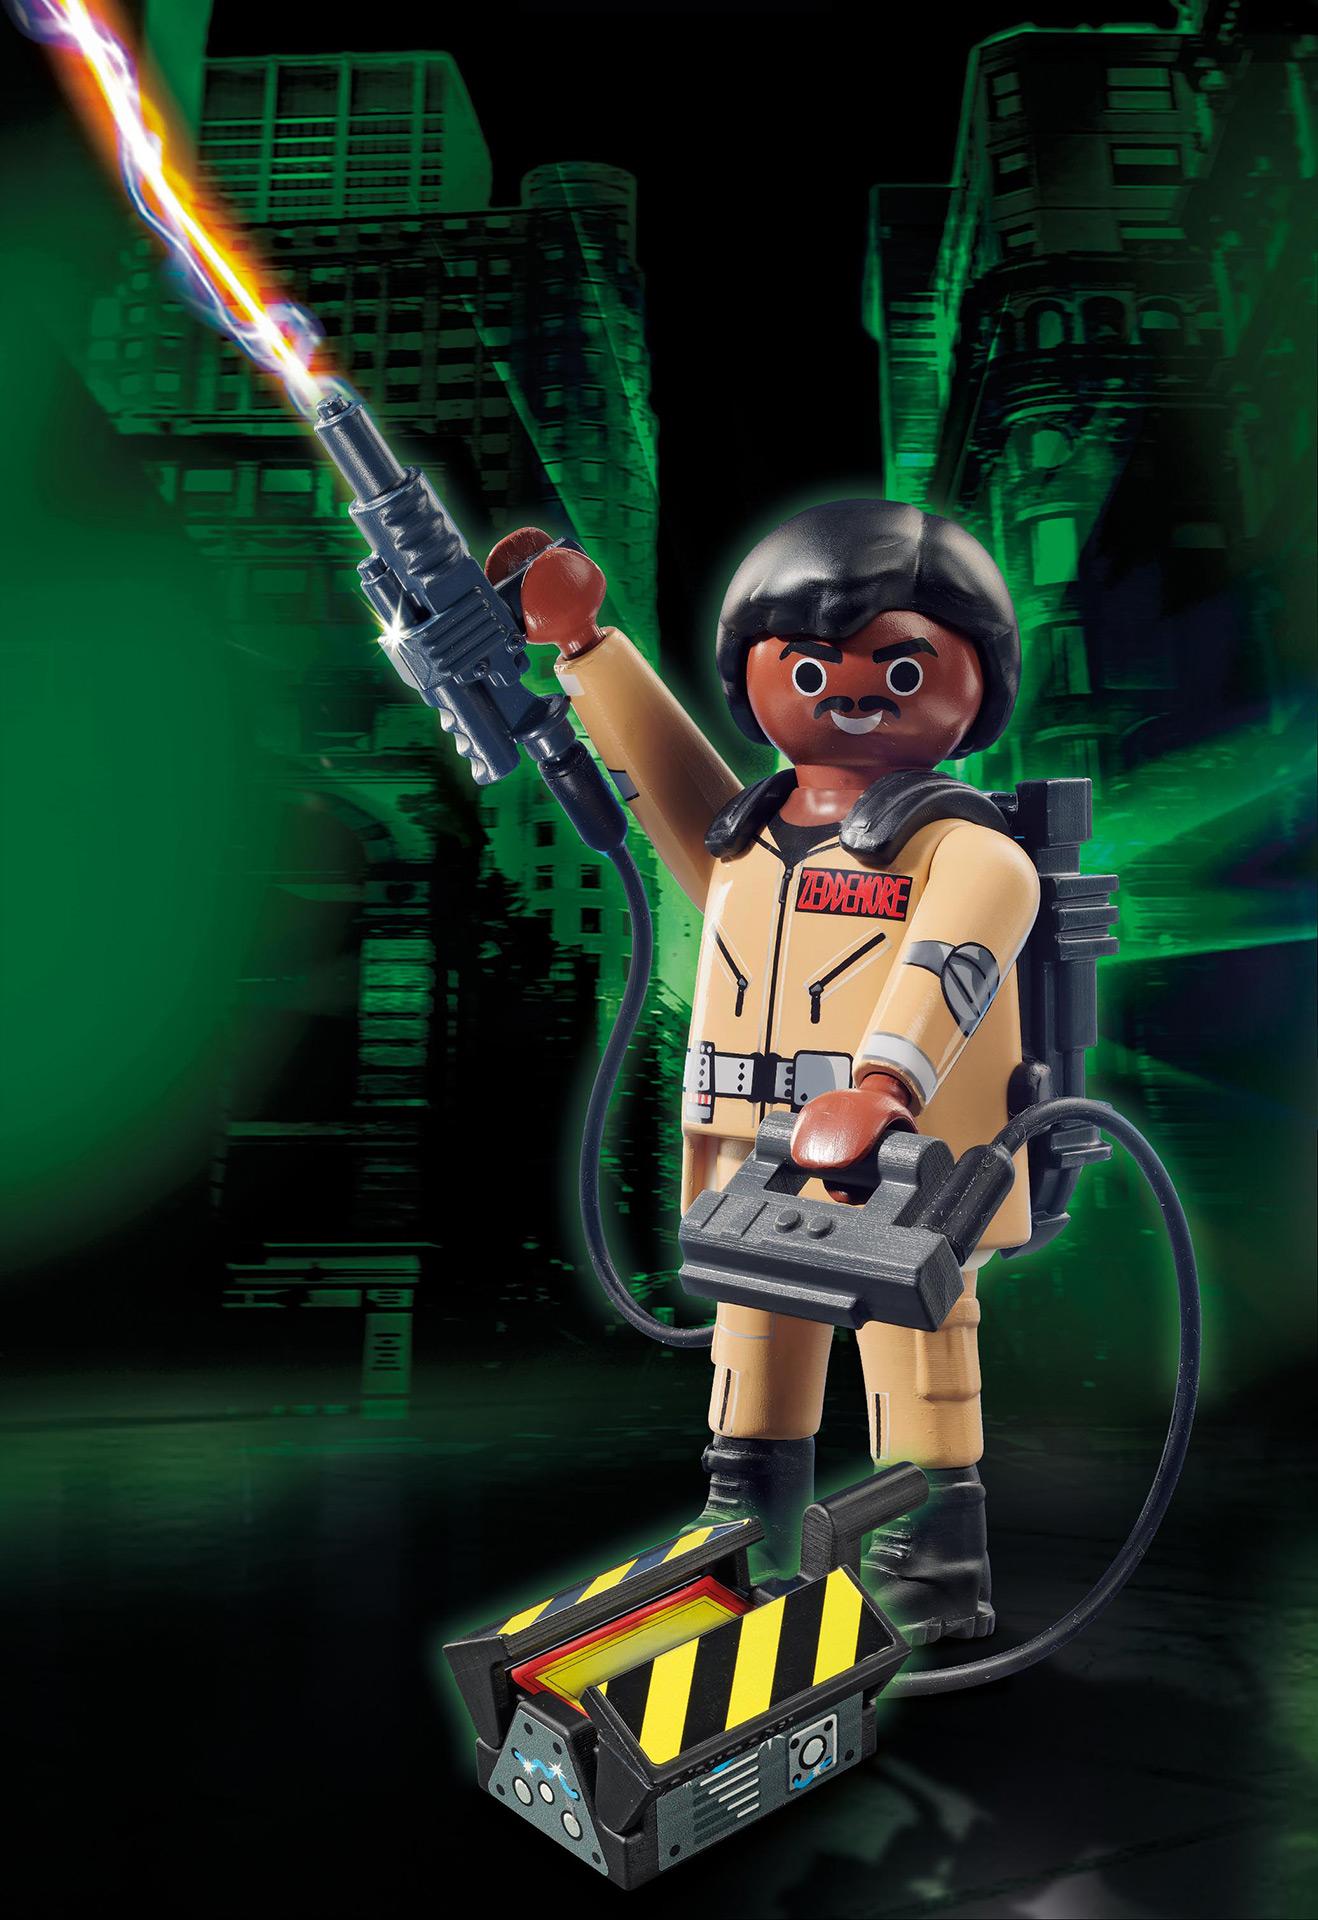 35 Jahre Ghostbusters - PLAYMOBIL_70171_Ghostbusters™ Sammlerfigur W. Zeddemore